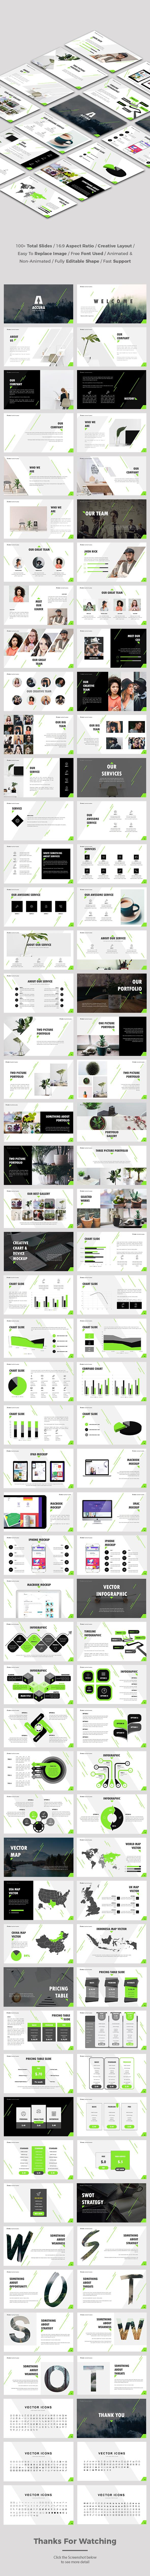 Accura - Pitch Deck Google Slides Template - Google Slides Presentation Templates